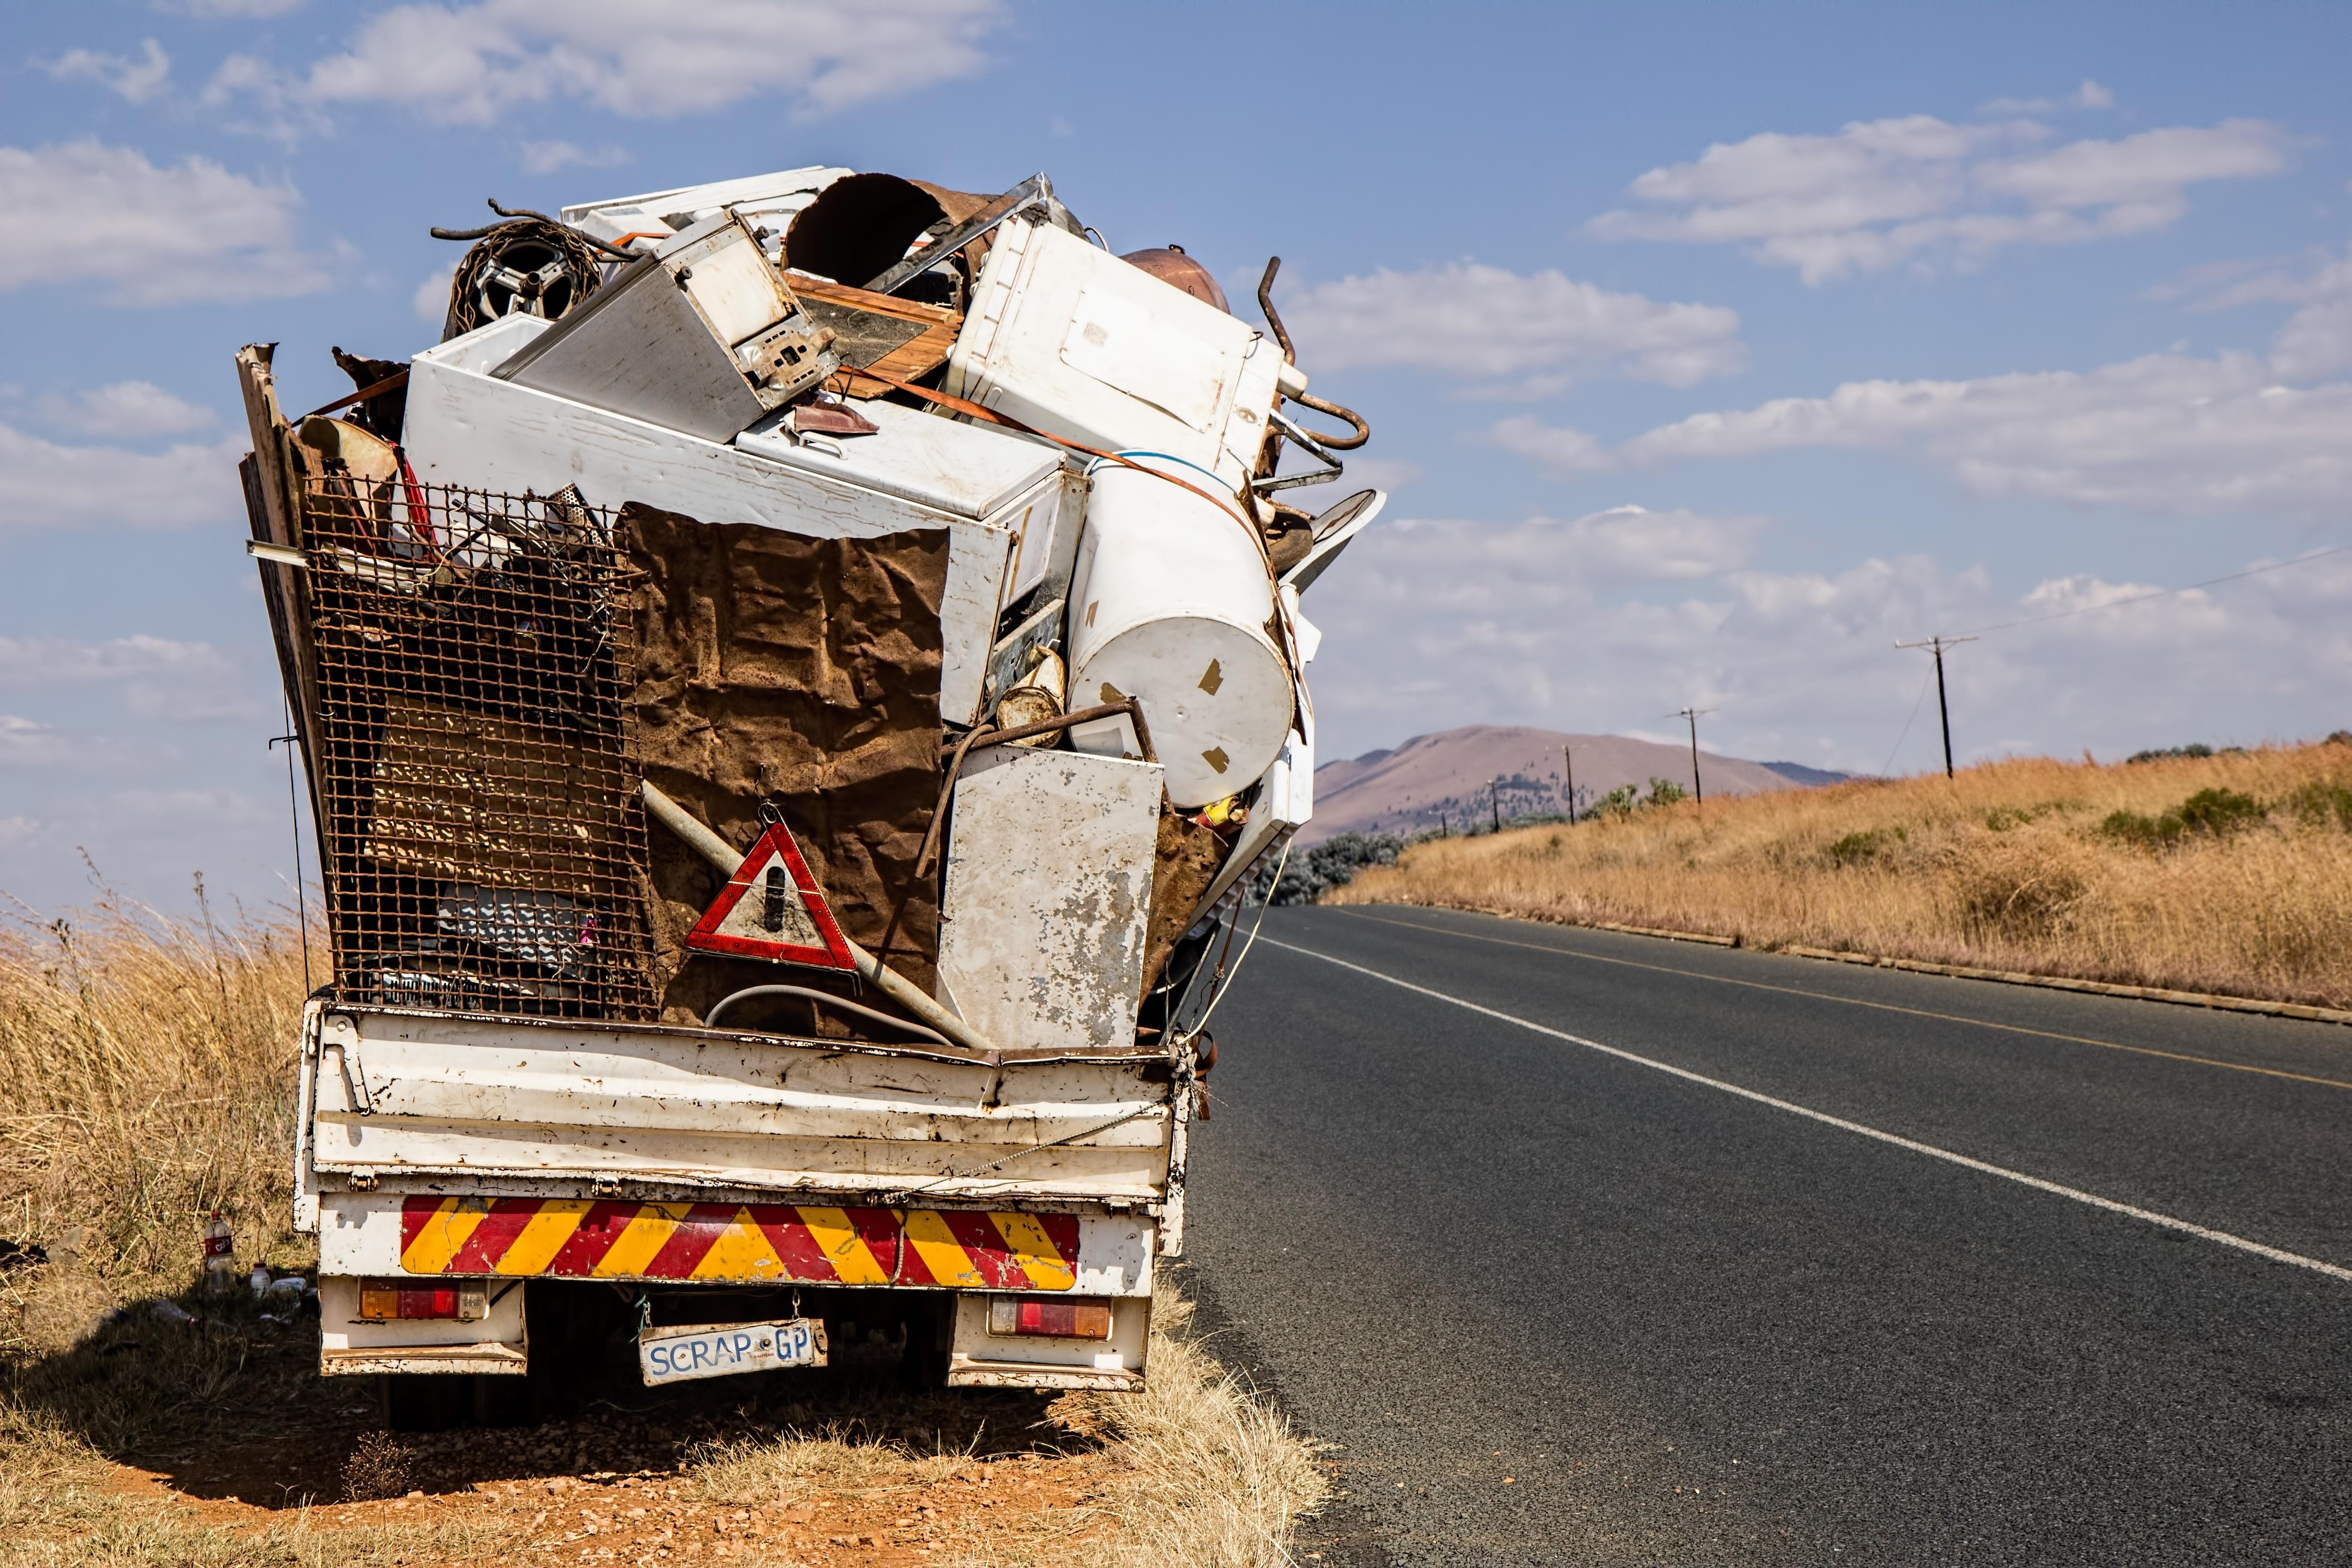 Free Images : old, asphalt, steel, transport, rust, truck, vehicle ...